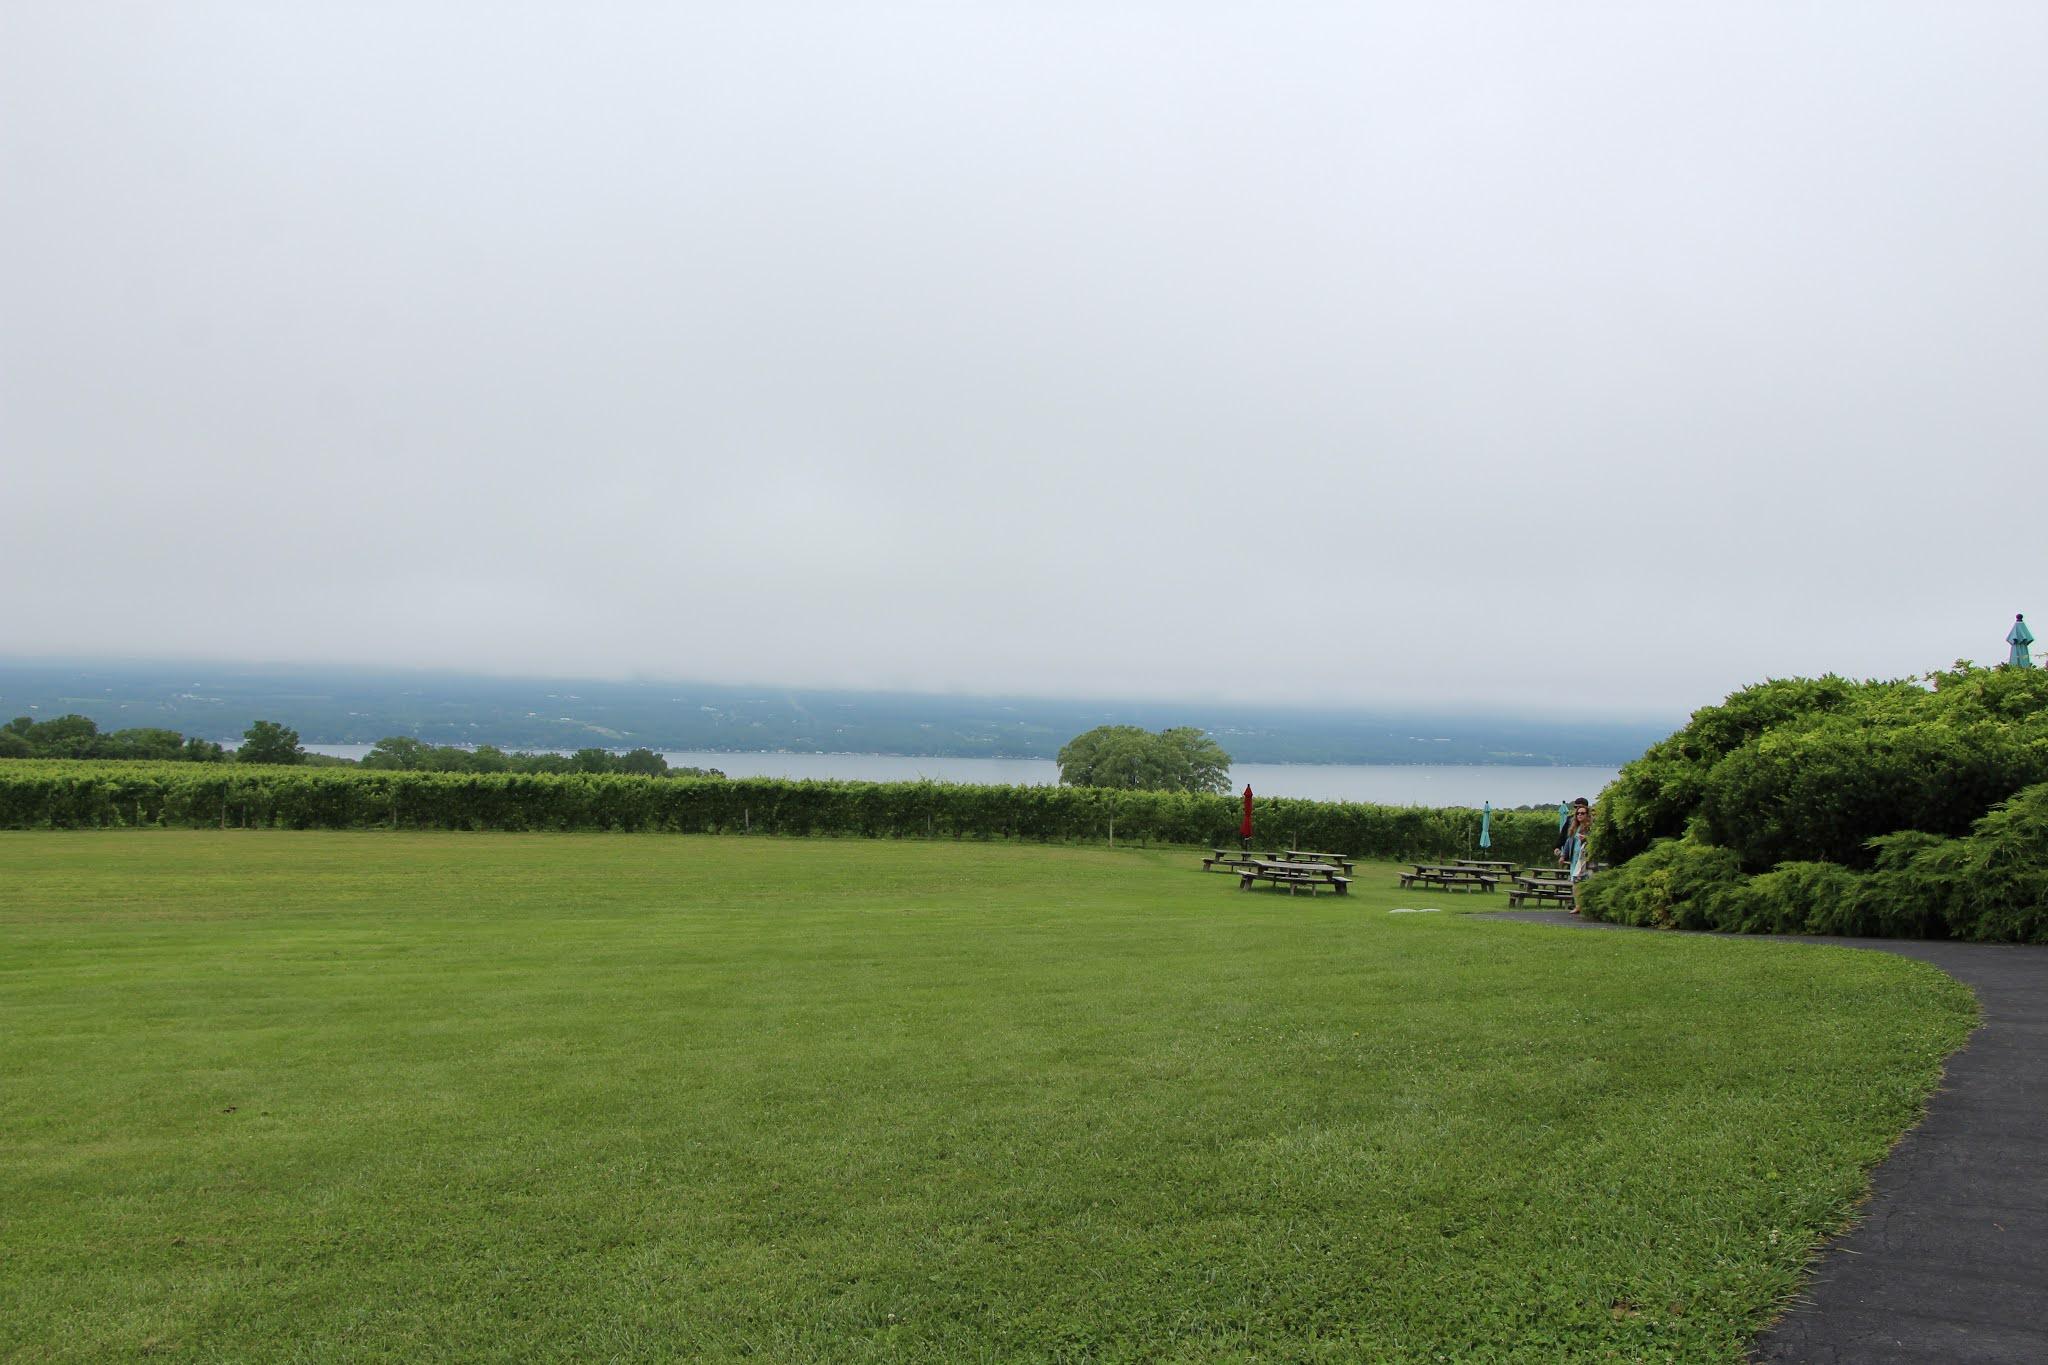 winery, wine tour, vineyard, finger lakes, upstate new york